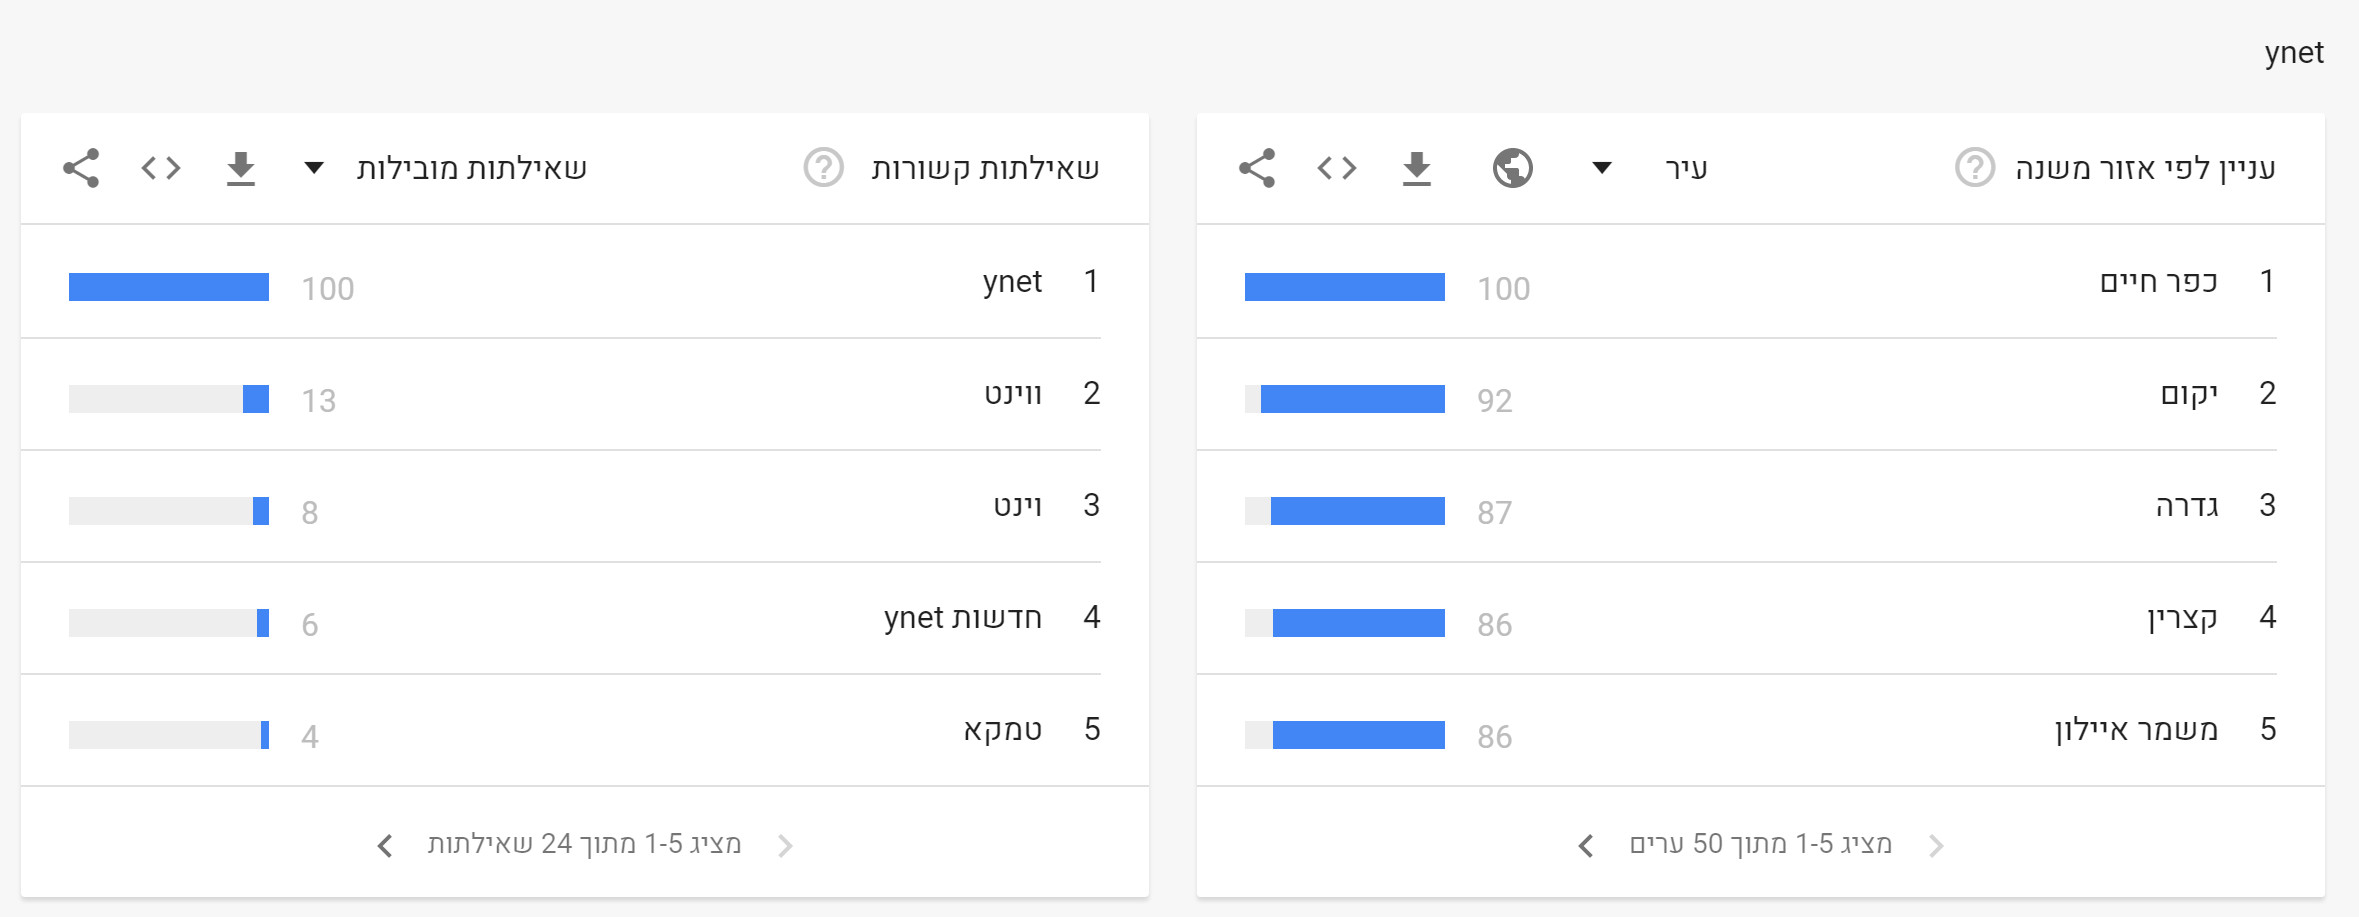 News 2019 in Google (4)